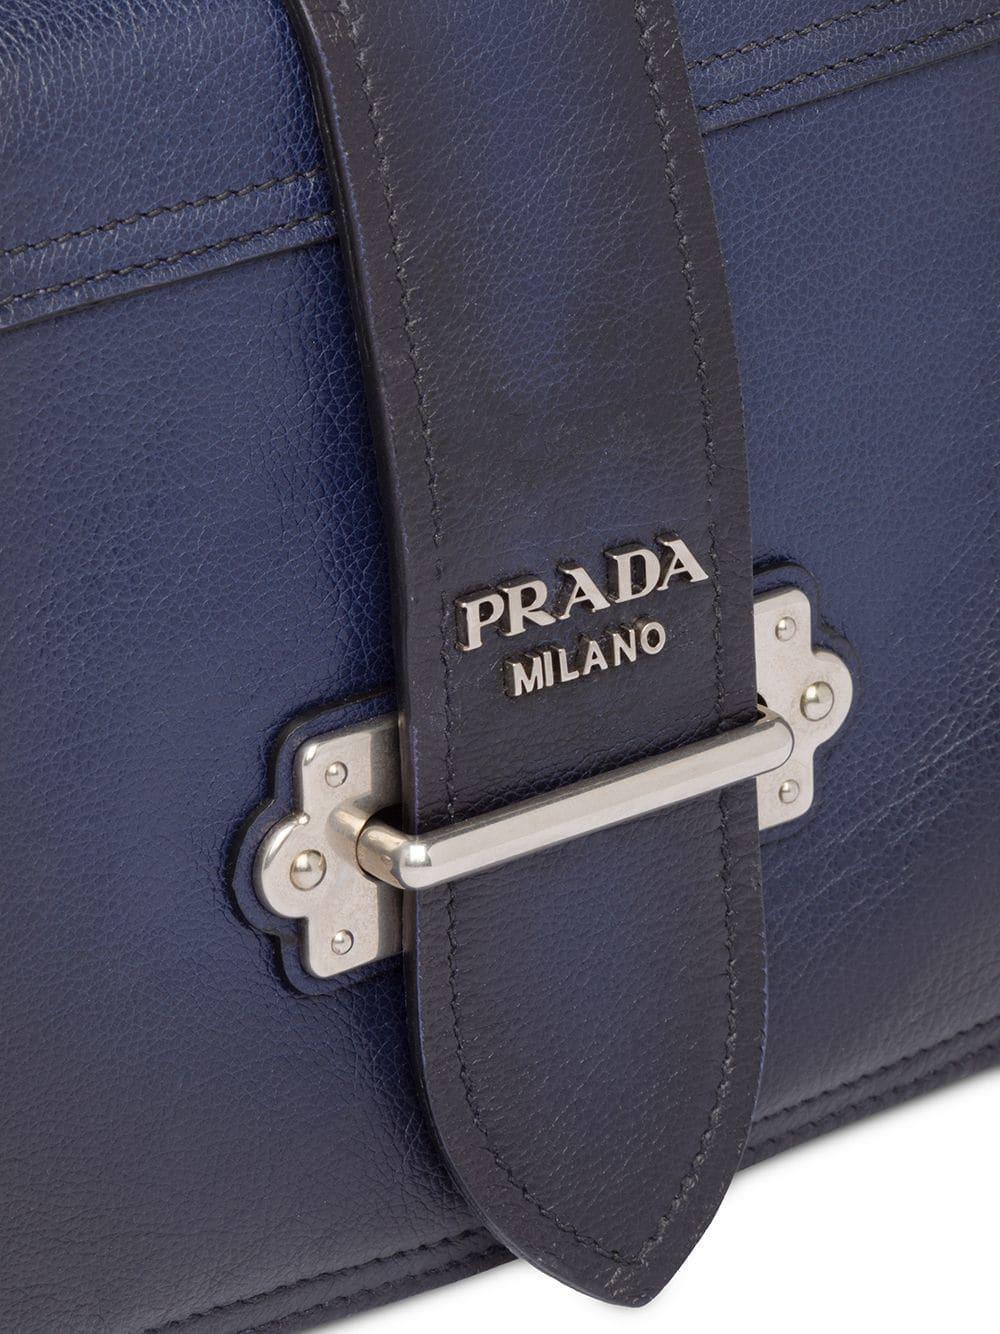 81e7f641297 Prada - Blue Cahier Shoulder Bag - Lyst. View fullscreen